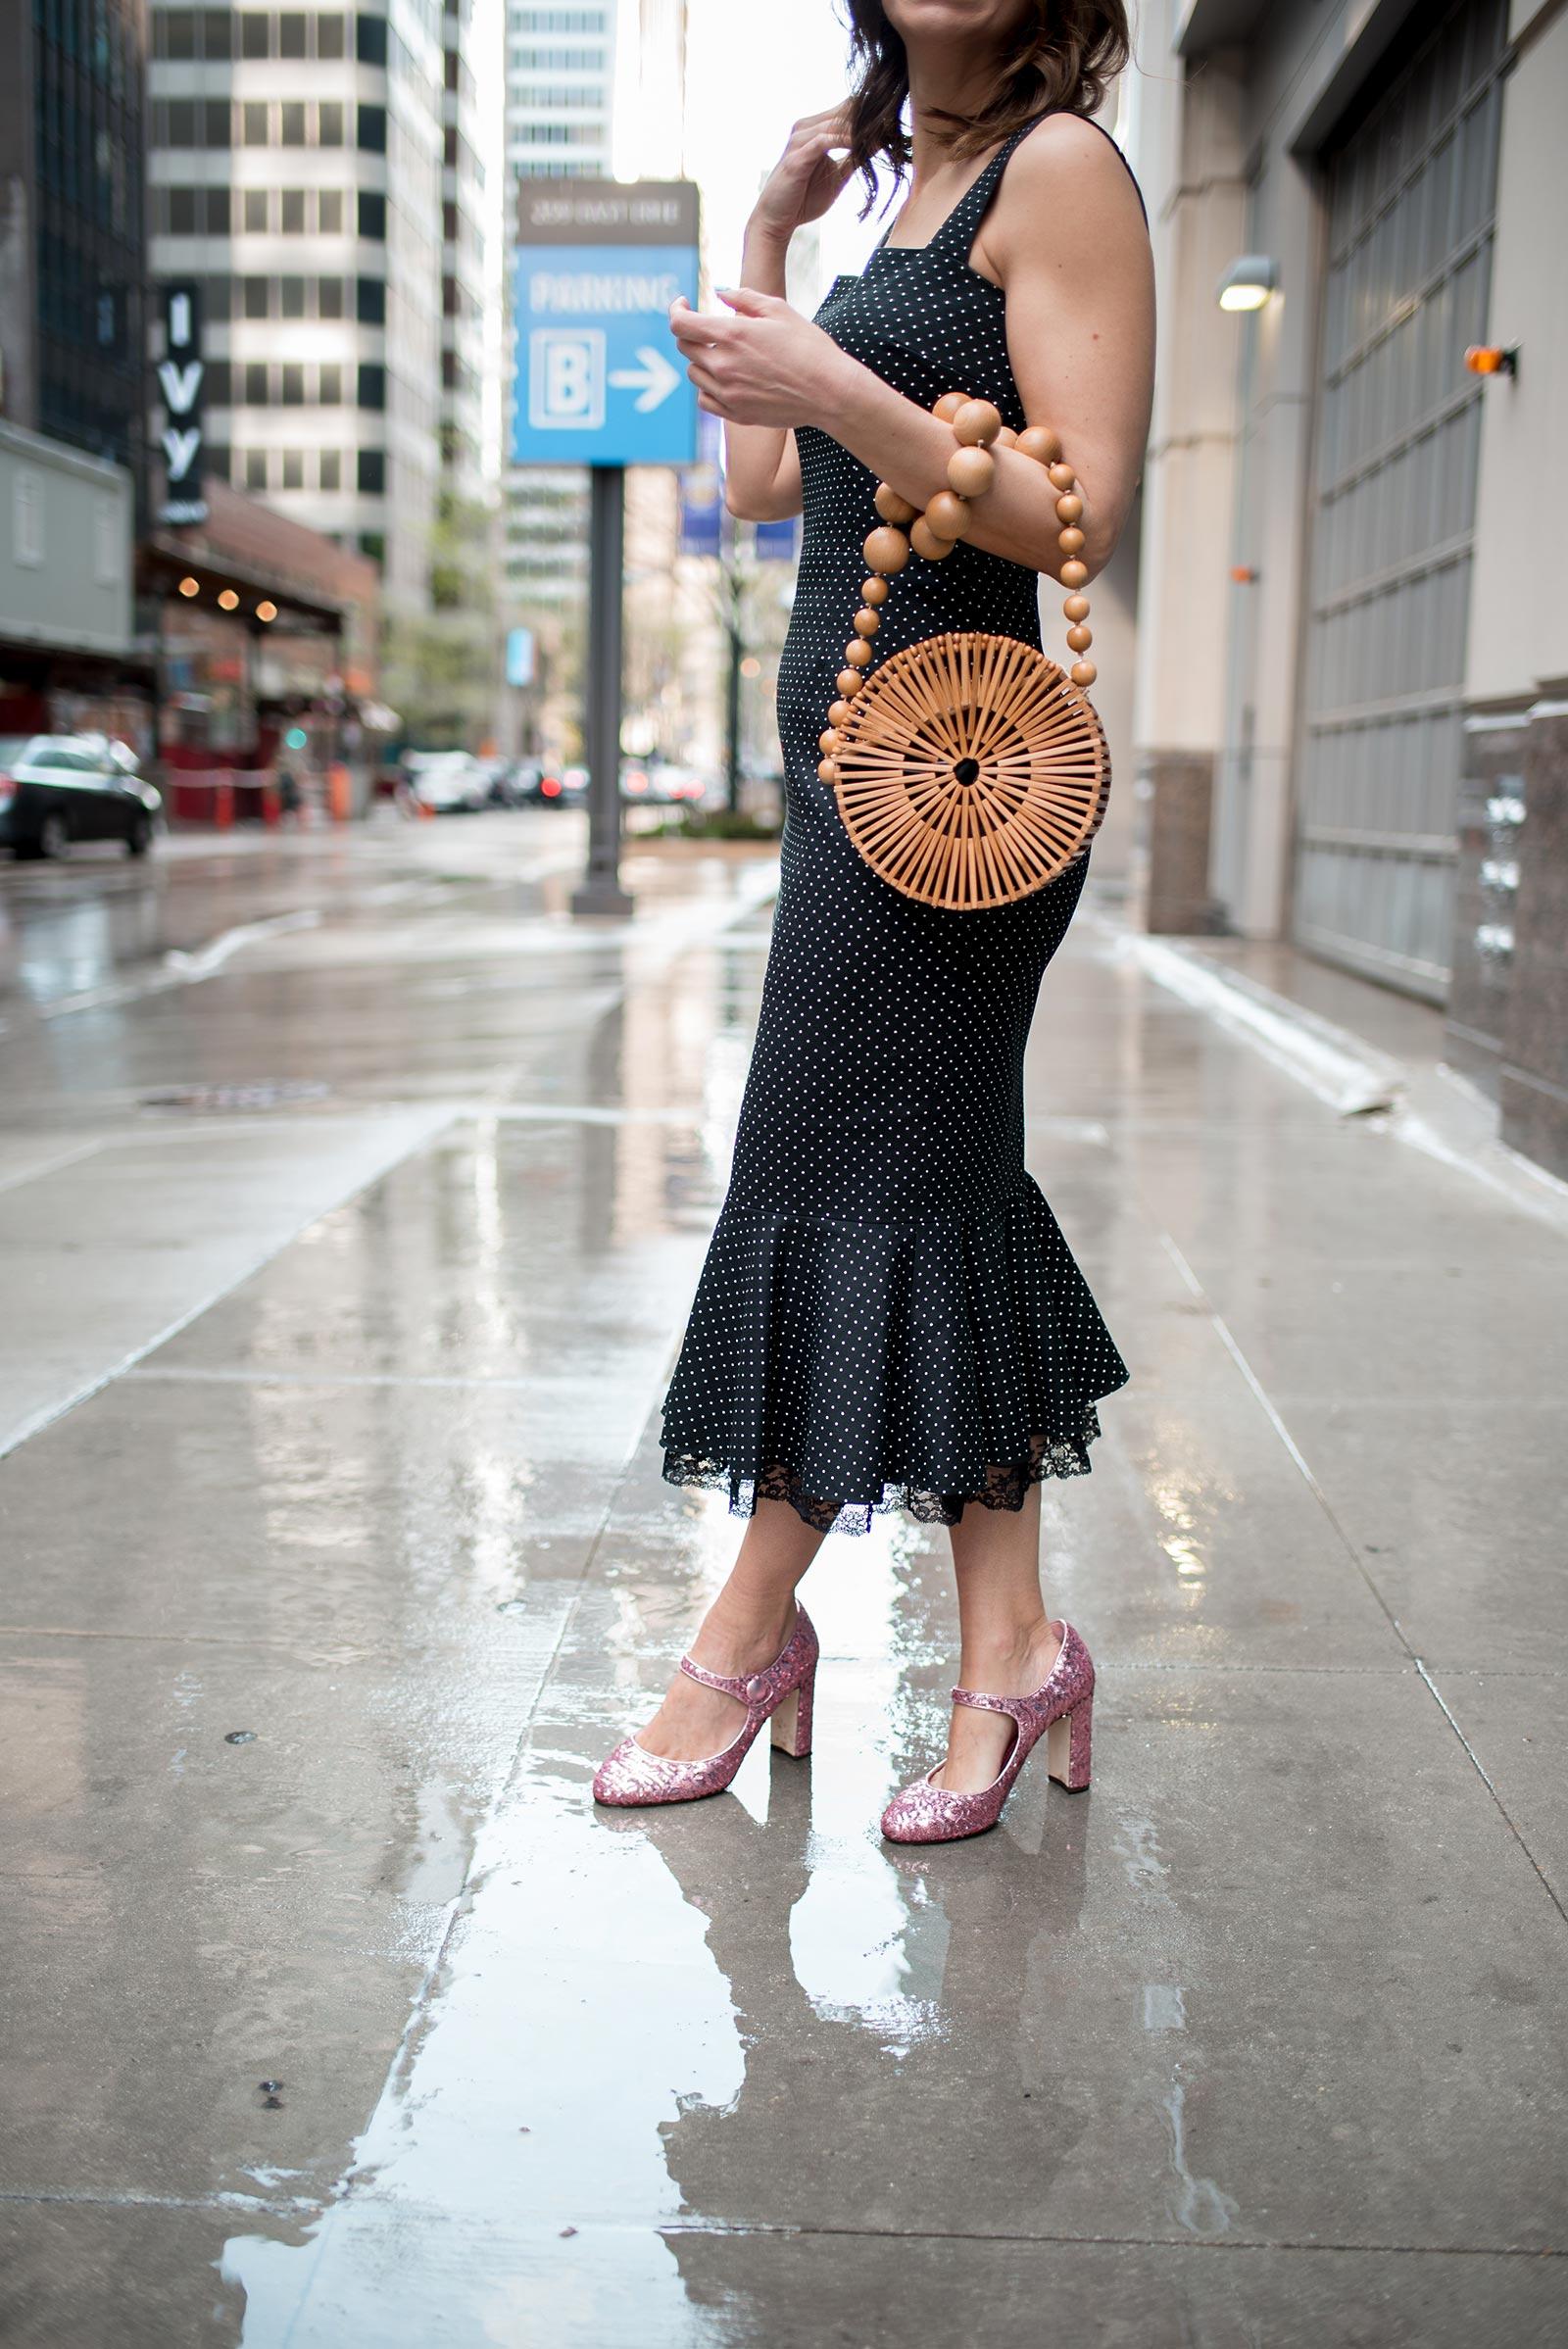 Anna Roufos Sosa of Noir Friday wearing a Dolce & Gabbana polka dot dress and a Cult Gaia bag.